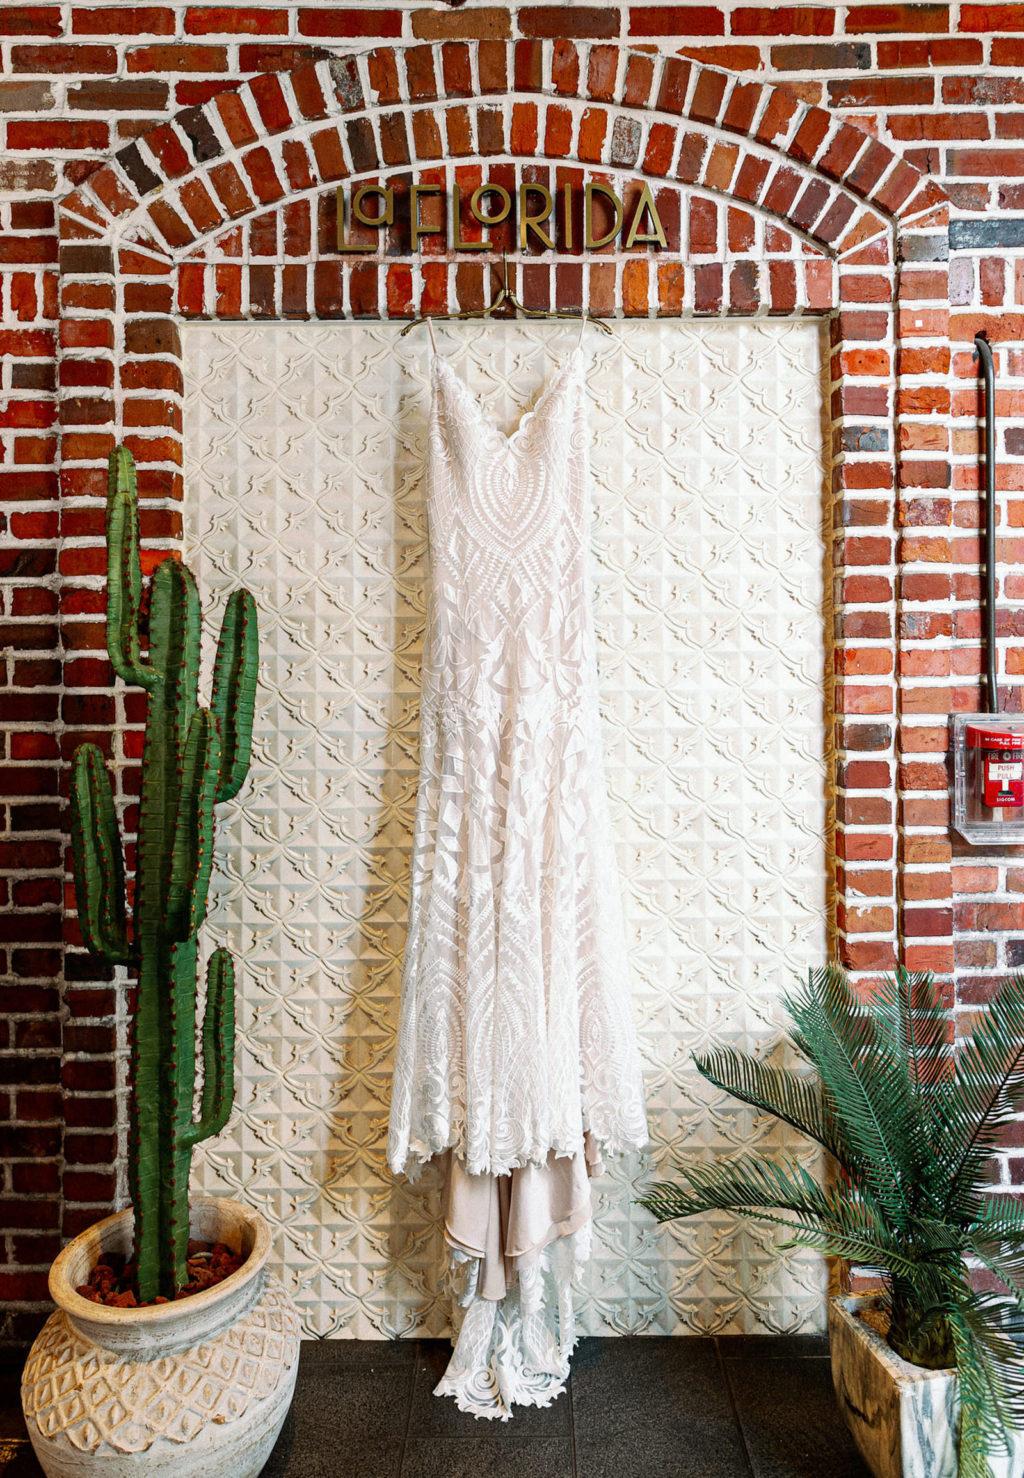 Romantic Boho Lace Spaghetti Strap V Neckline Wedding Dress Hanging on Red Brick Wall   Tampa Bay Wedding Photographer Dewitt for Love